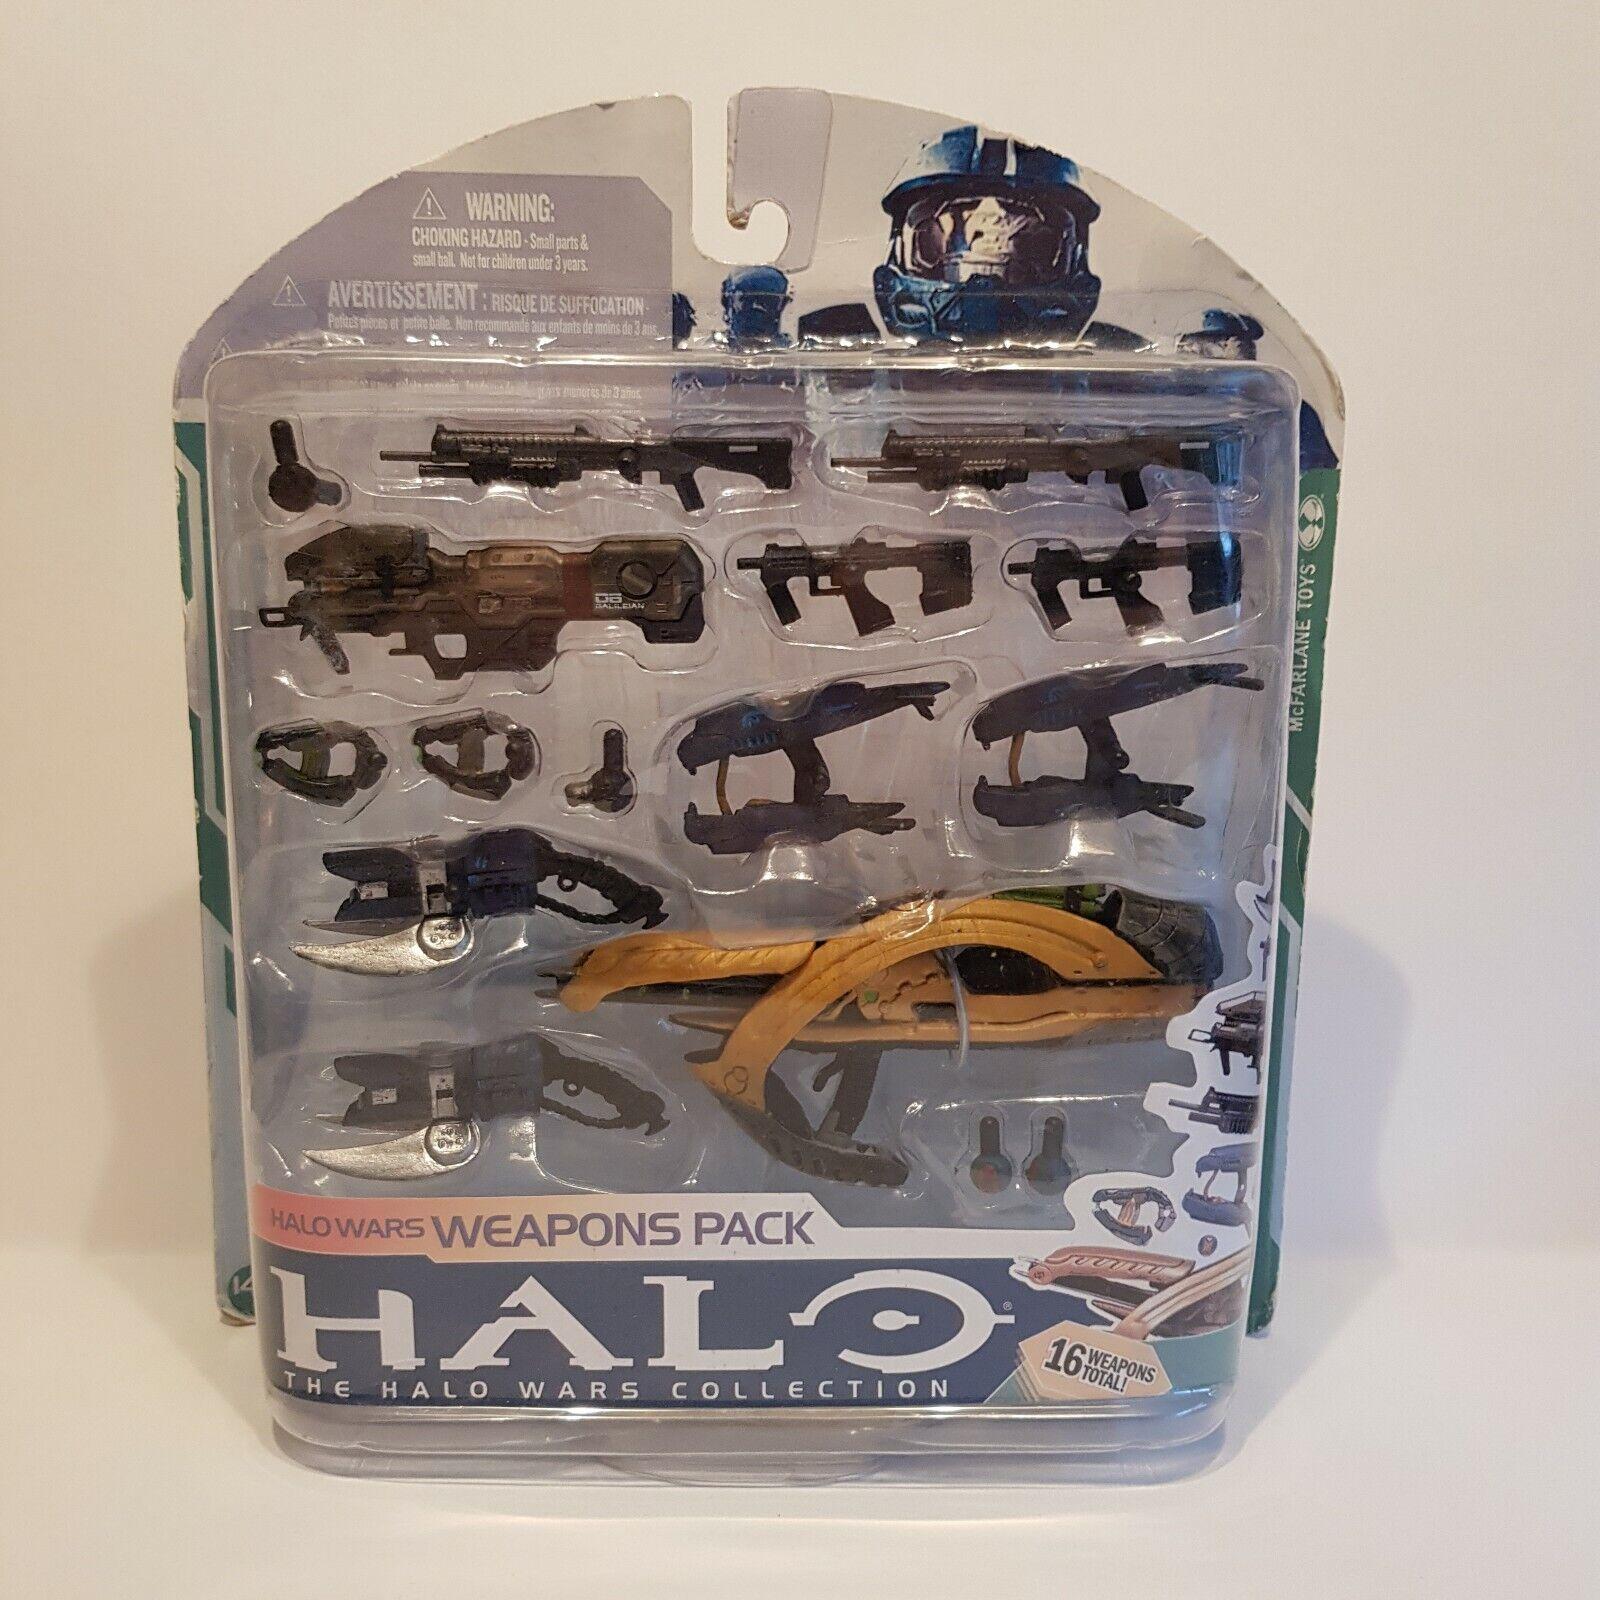 Halo Wars Mcfarlane Weapons Pack sealed shelf worn